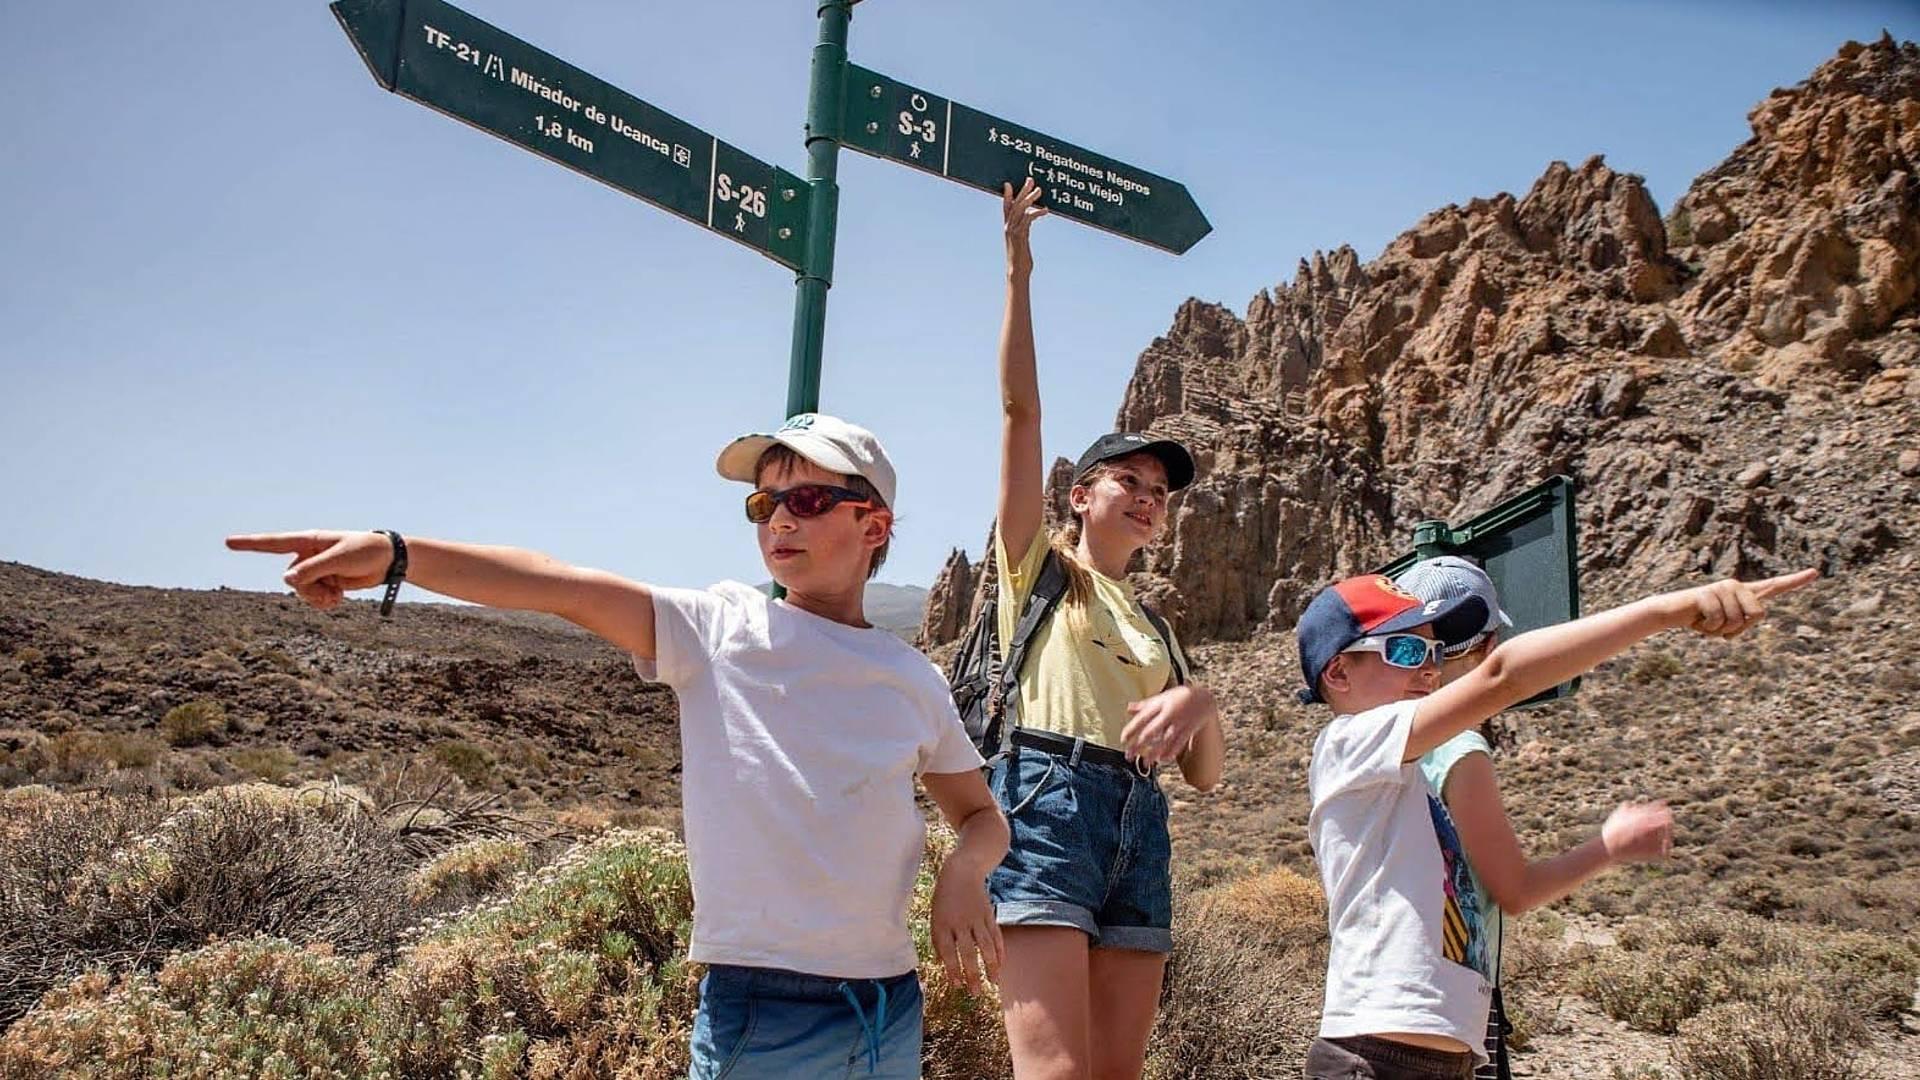 Aventure et nature en famille: Tenerife et La Gomera